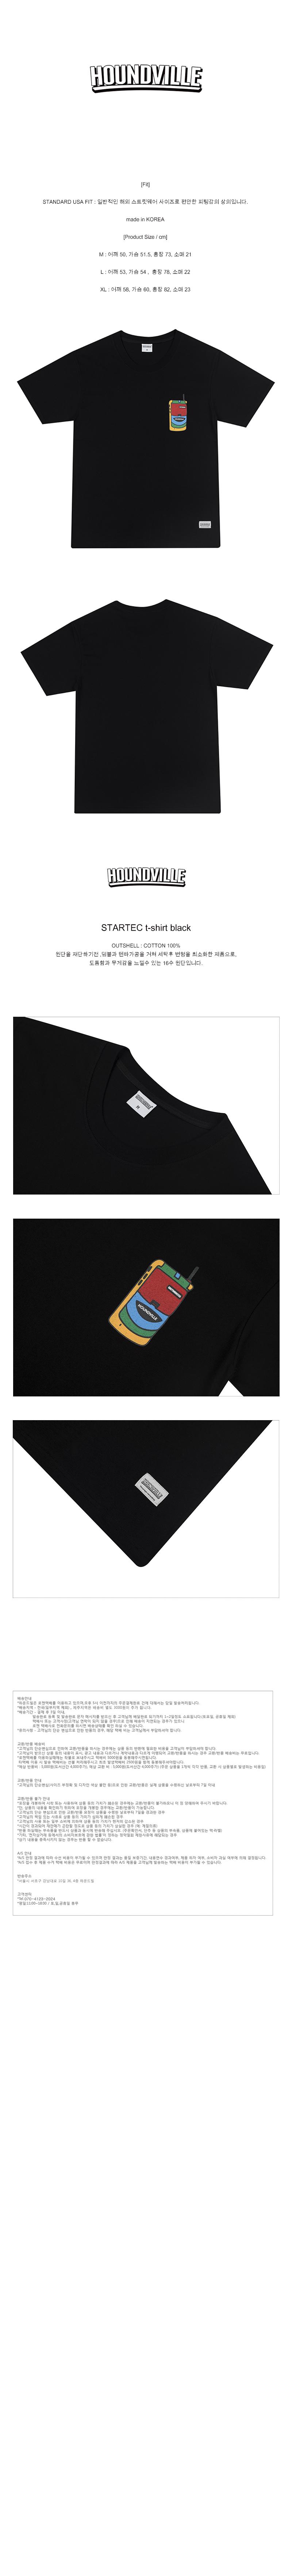 STARTEC t-shirt black.jpg